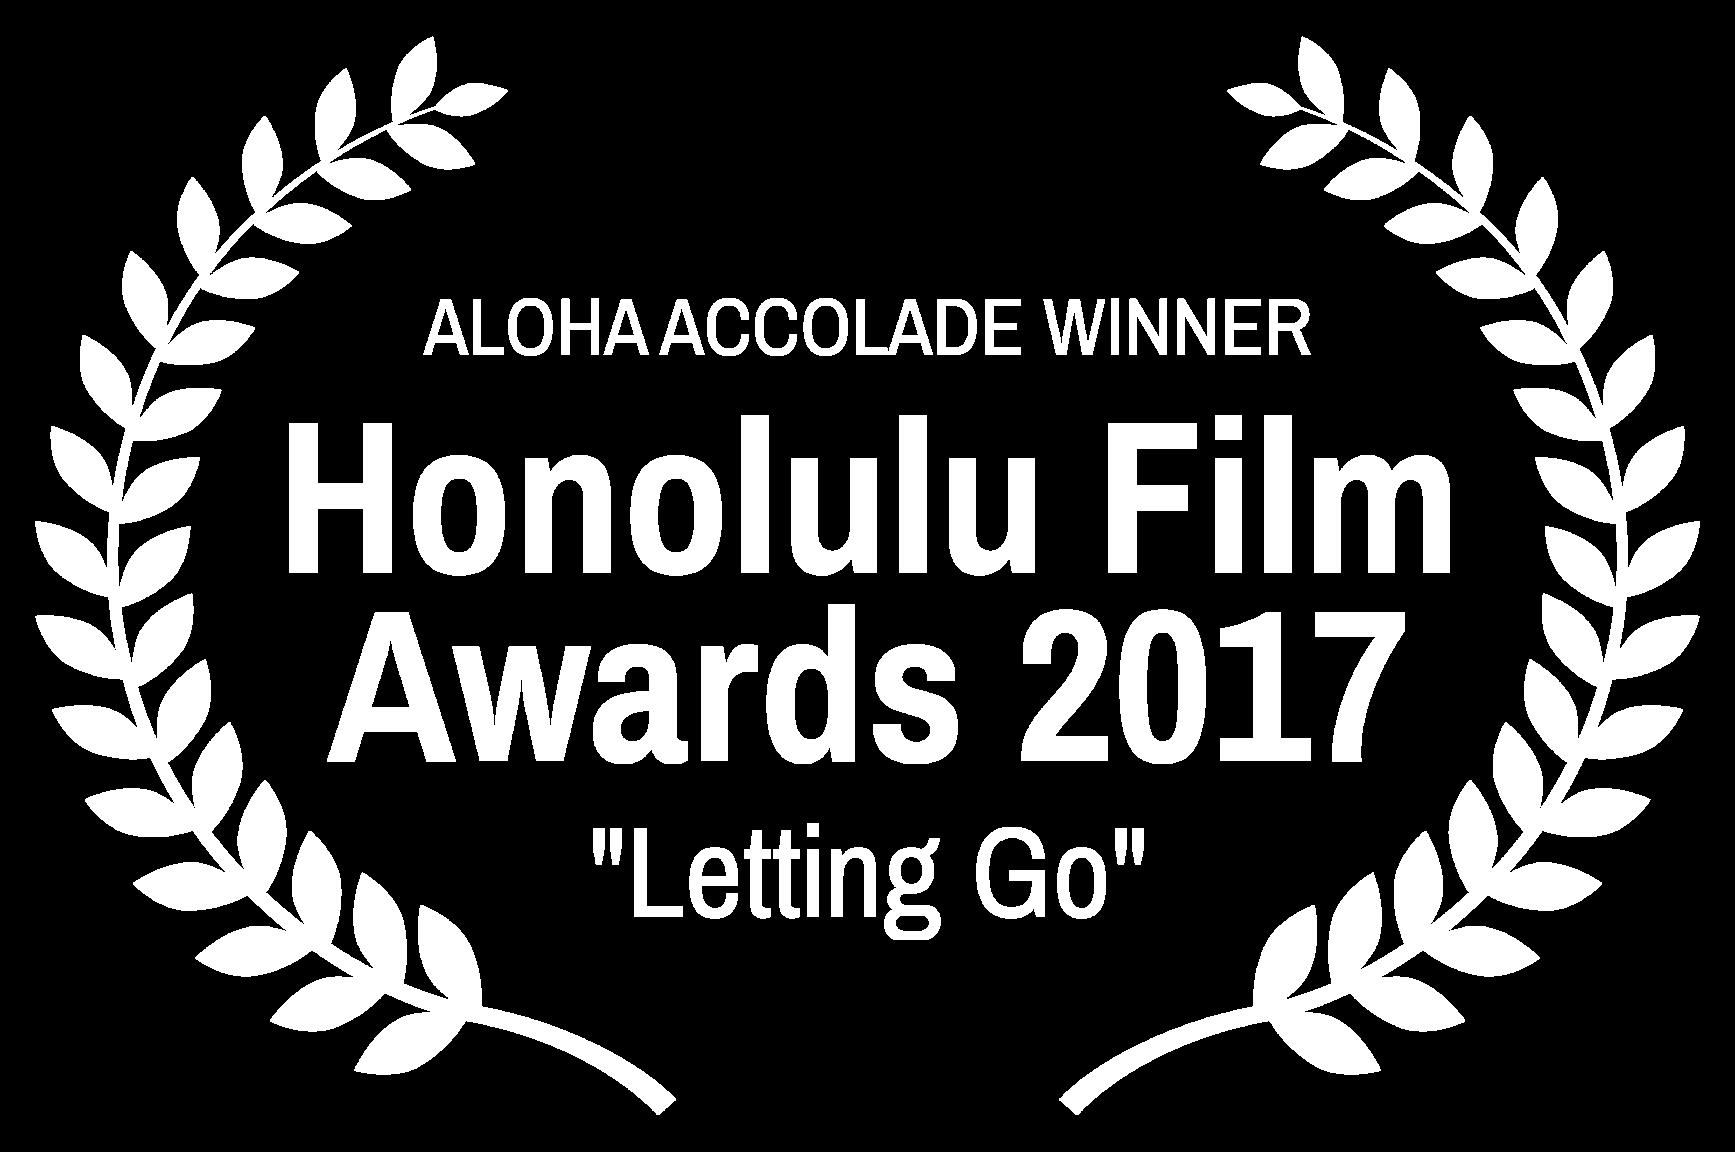 ALOHA ACCOLADE WINNER - Honolulu Film Awards 2017 - Letting Go.png